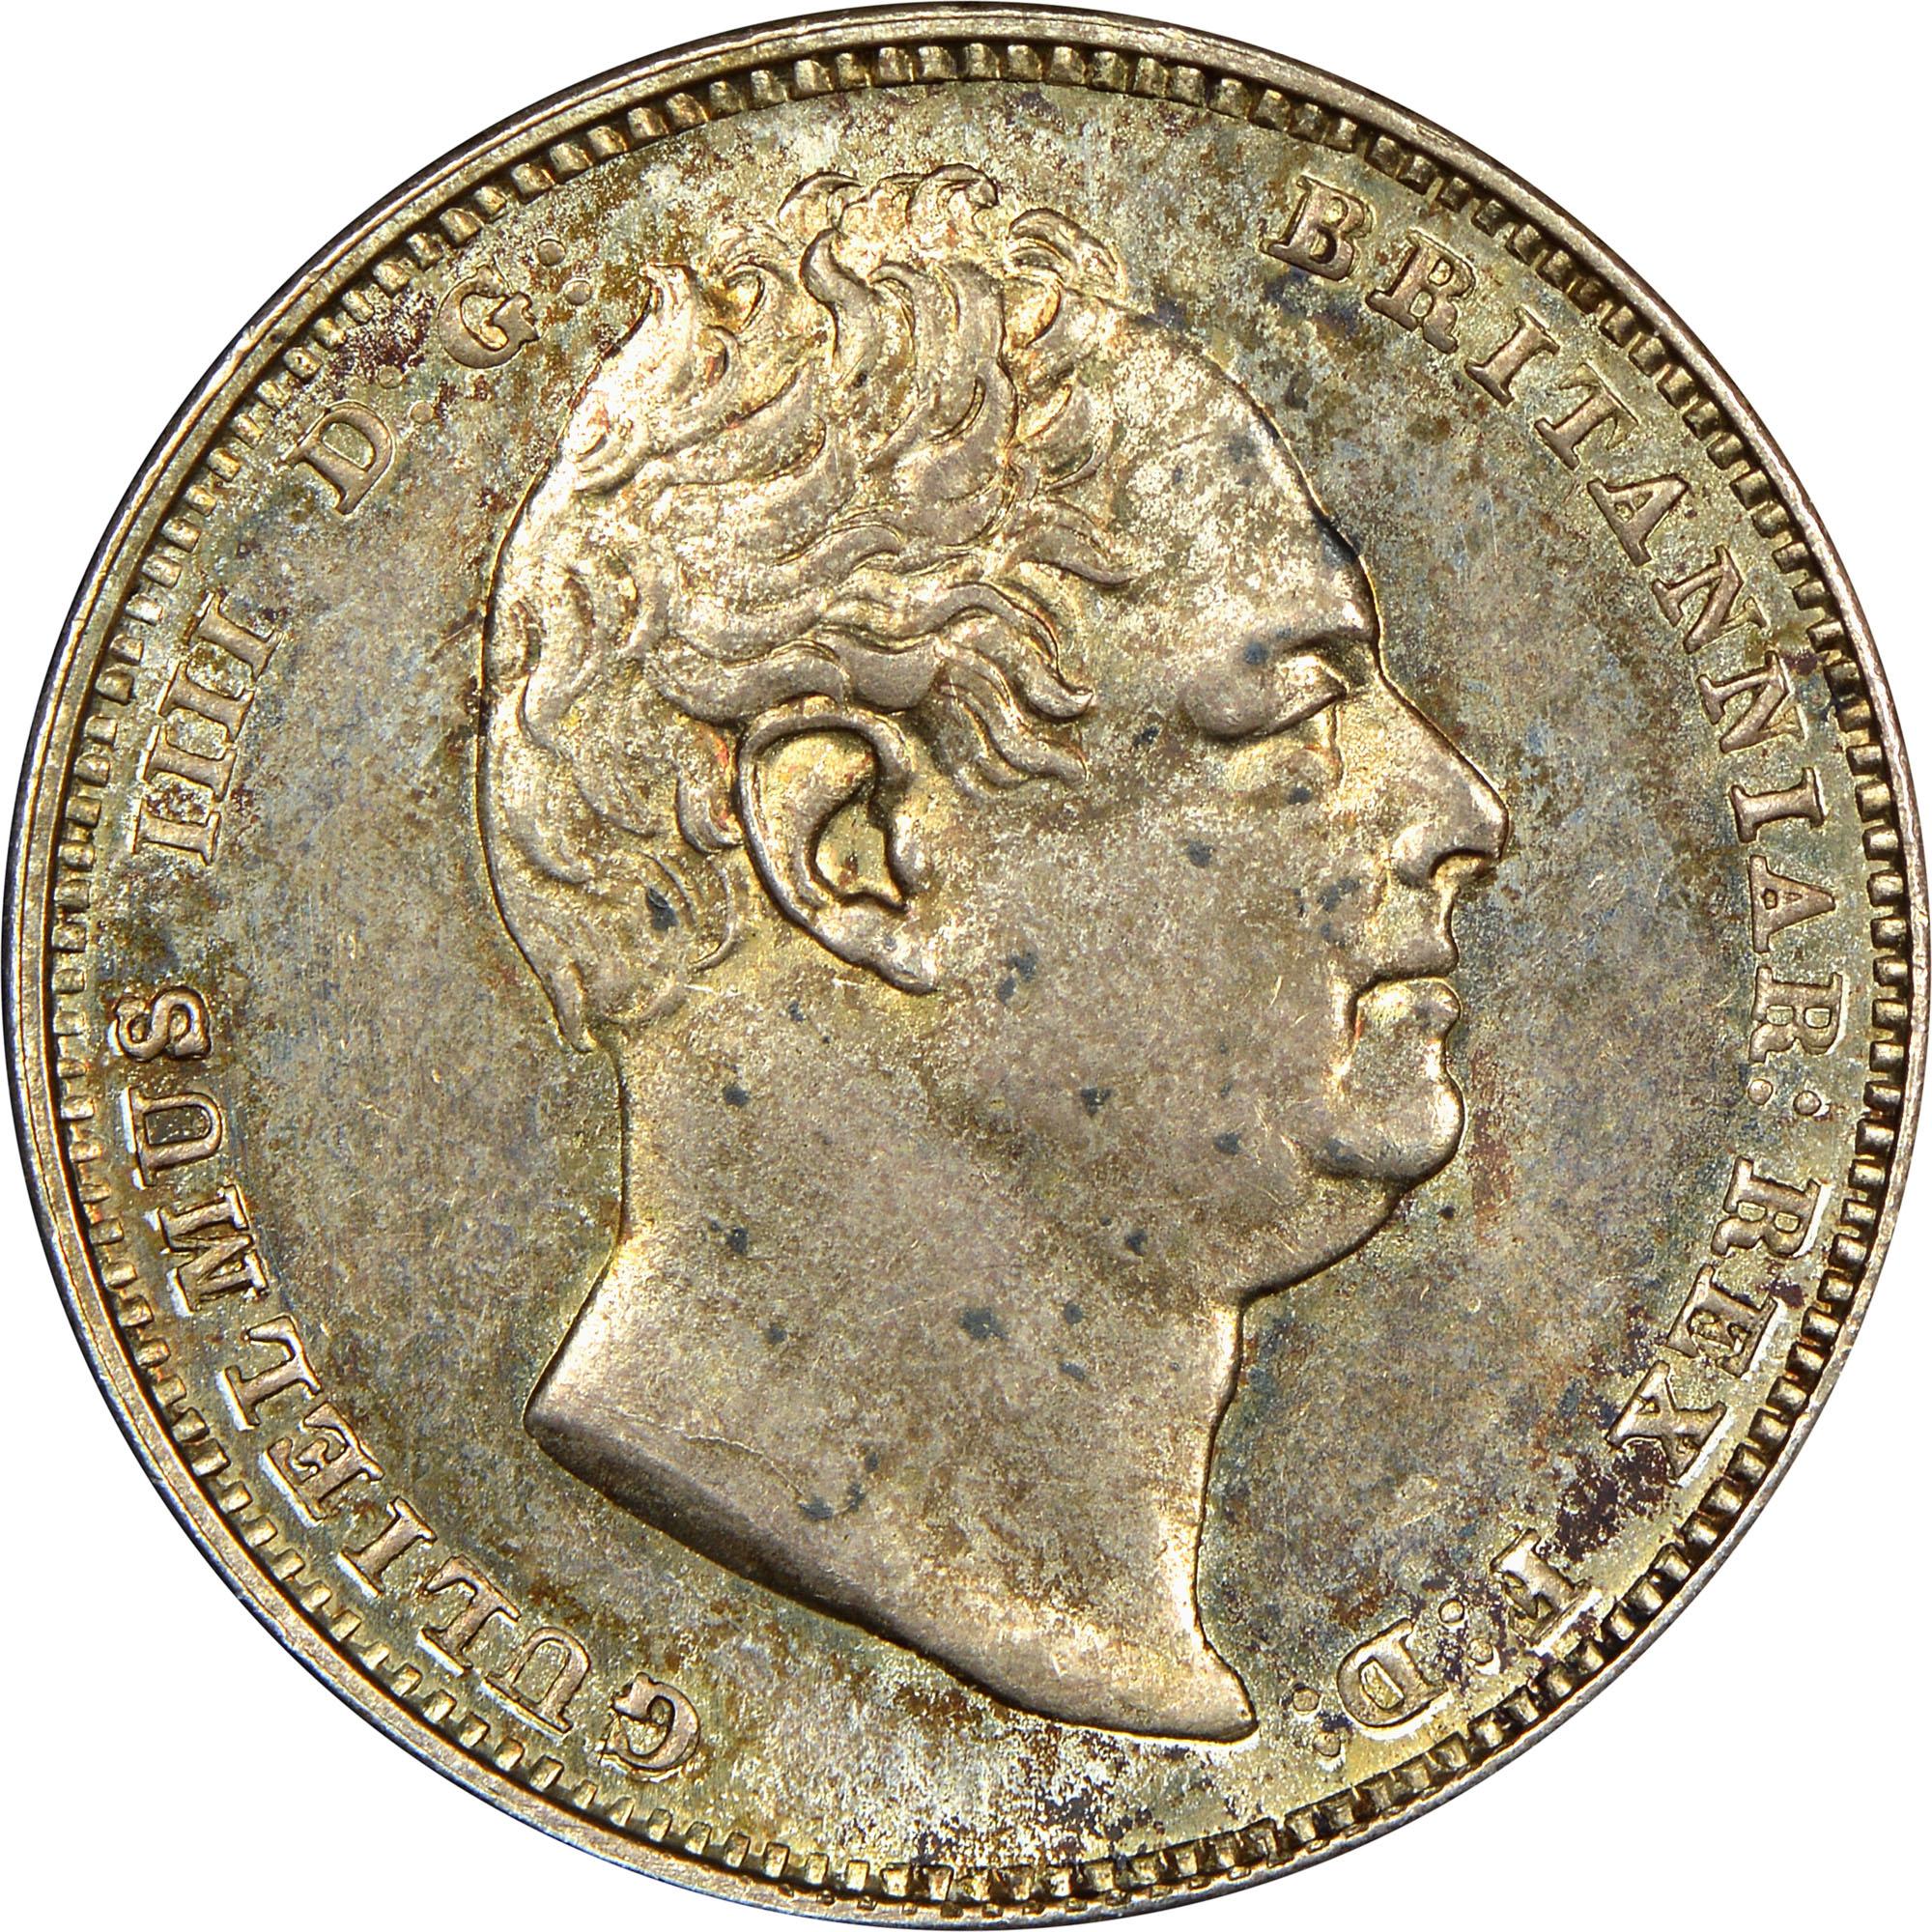 1836 Guyana 1/2 Guilder obverse